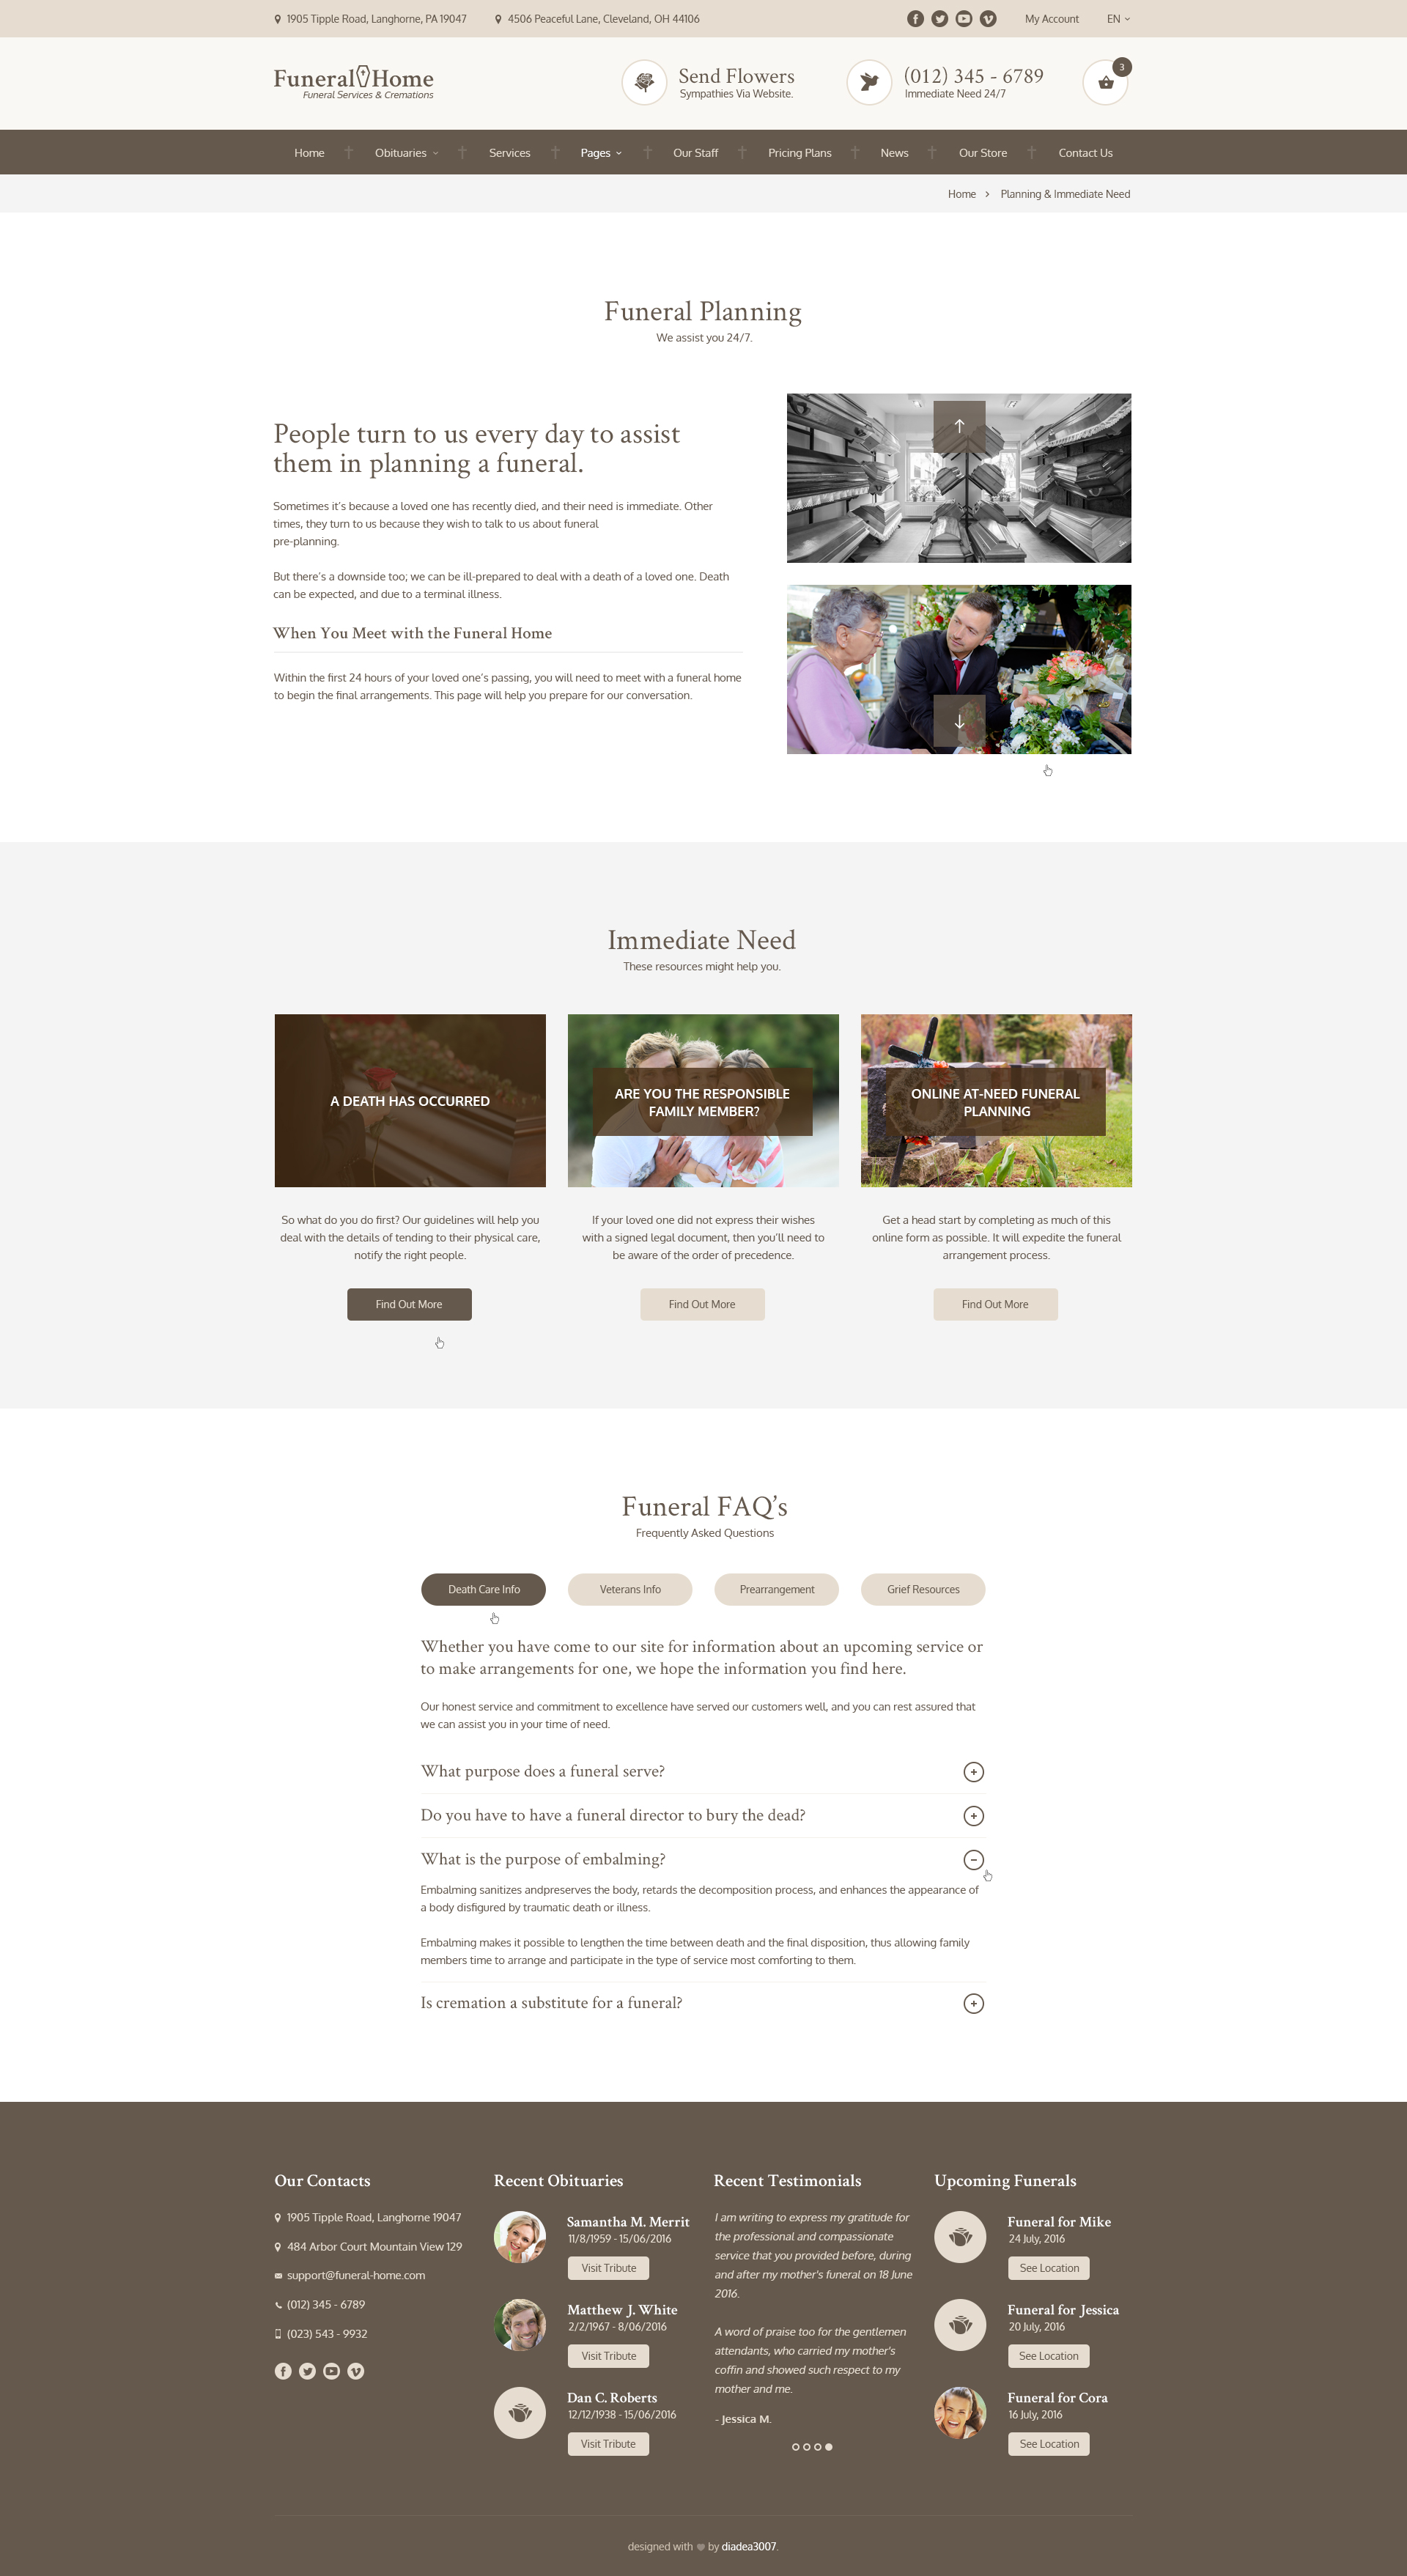 funeral home - funeral services & cemetery psd templatediadea3007